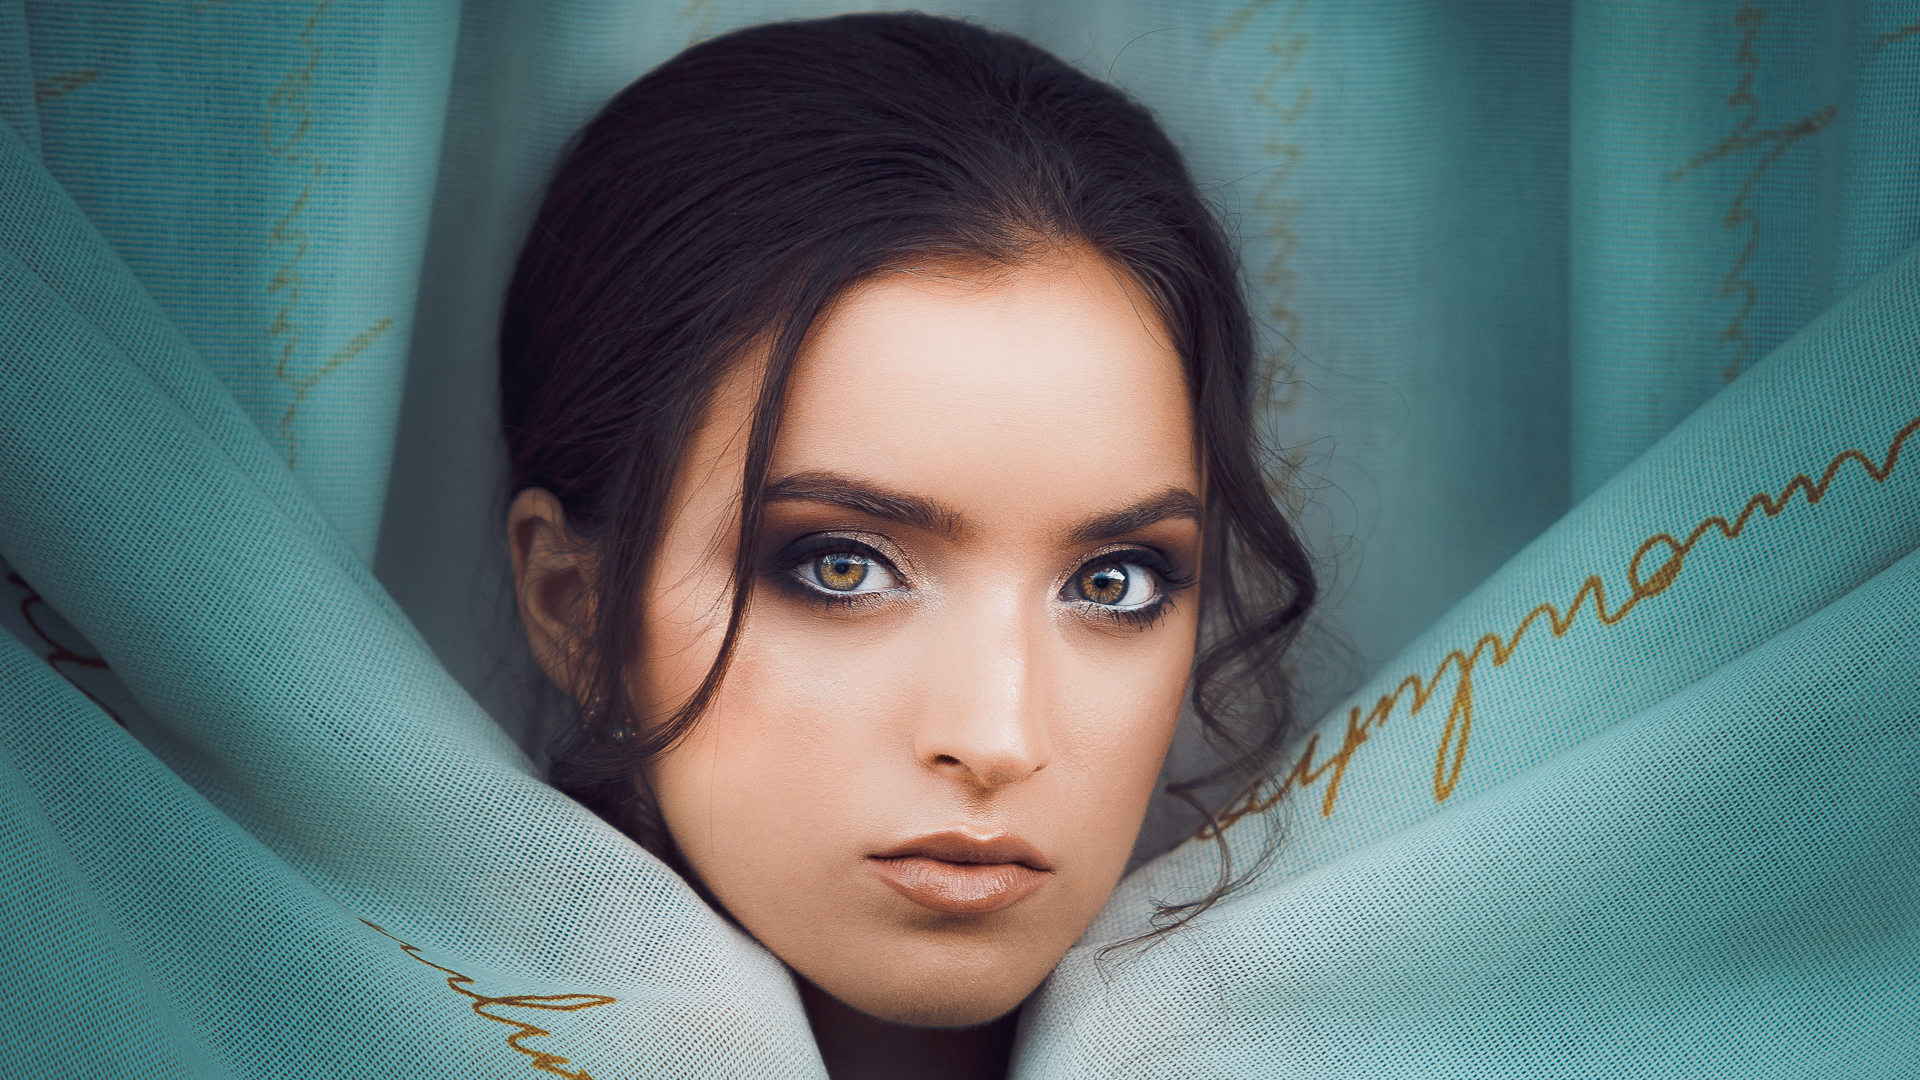 Gligor Cristina (Romania) - Beautiful woman